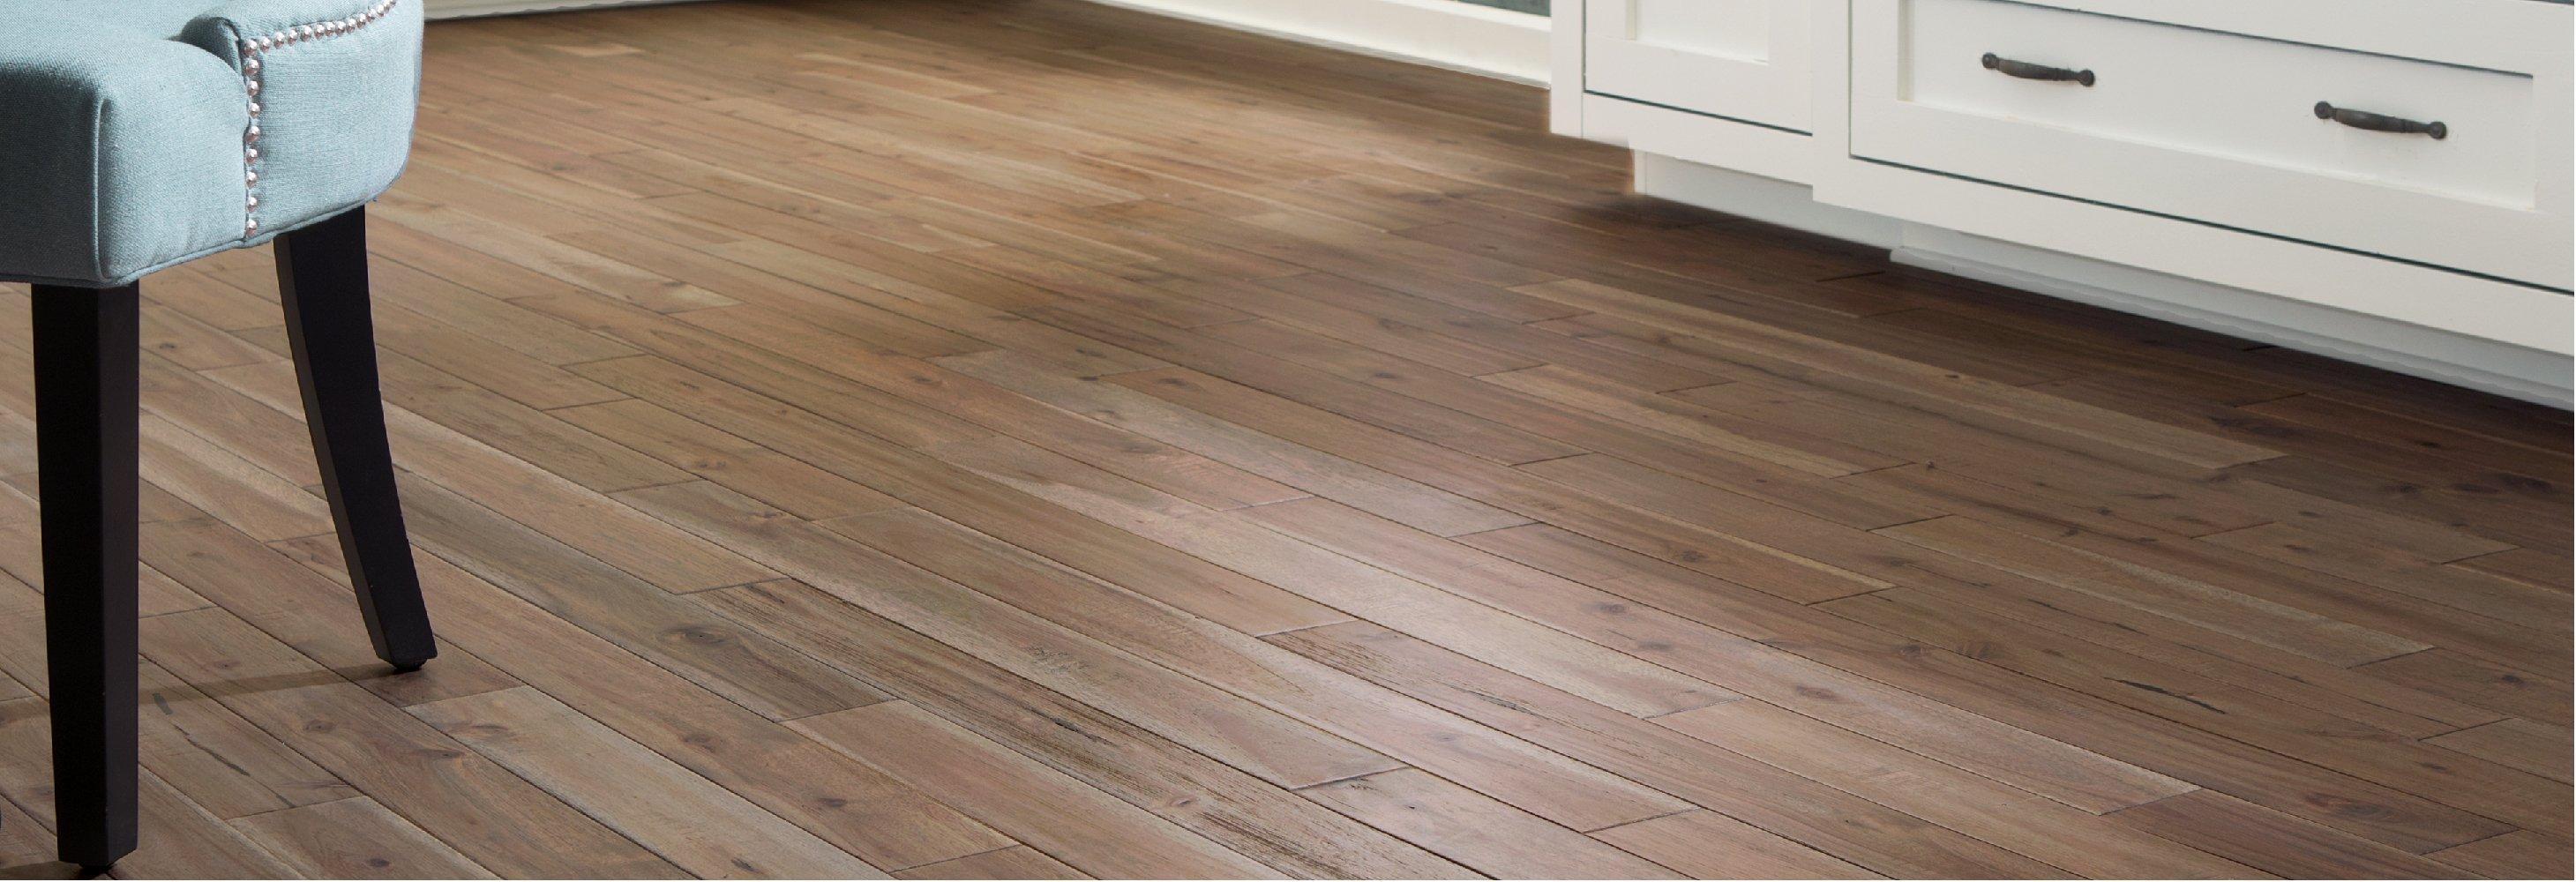 solid hardwood floor solid hardwood flooring PEVRESY